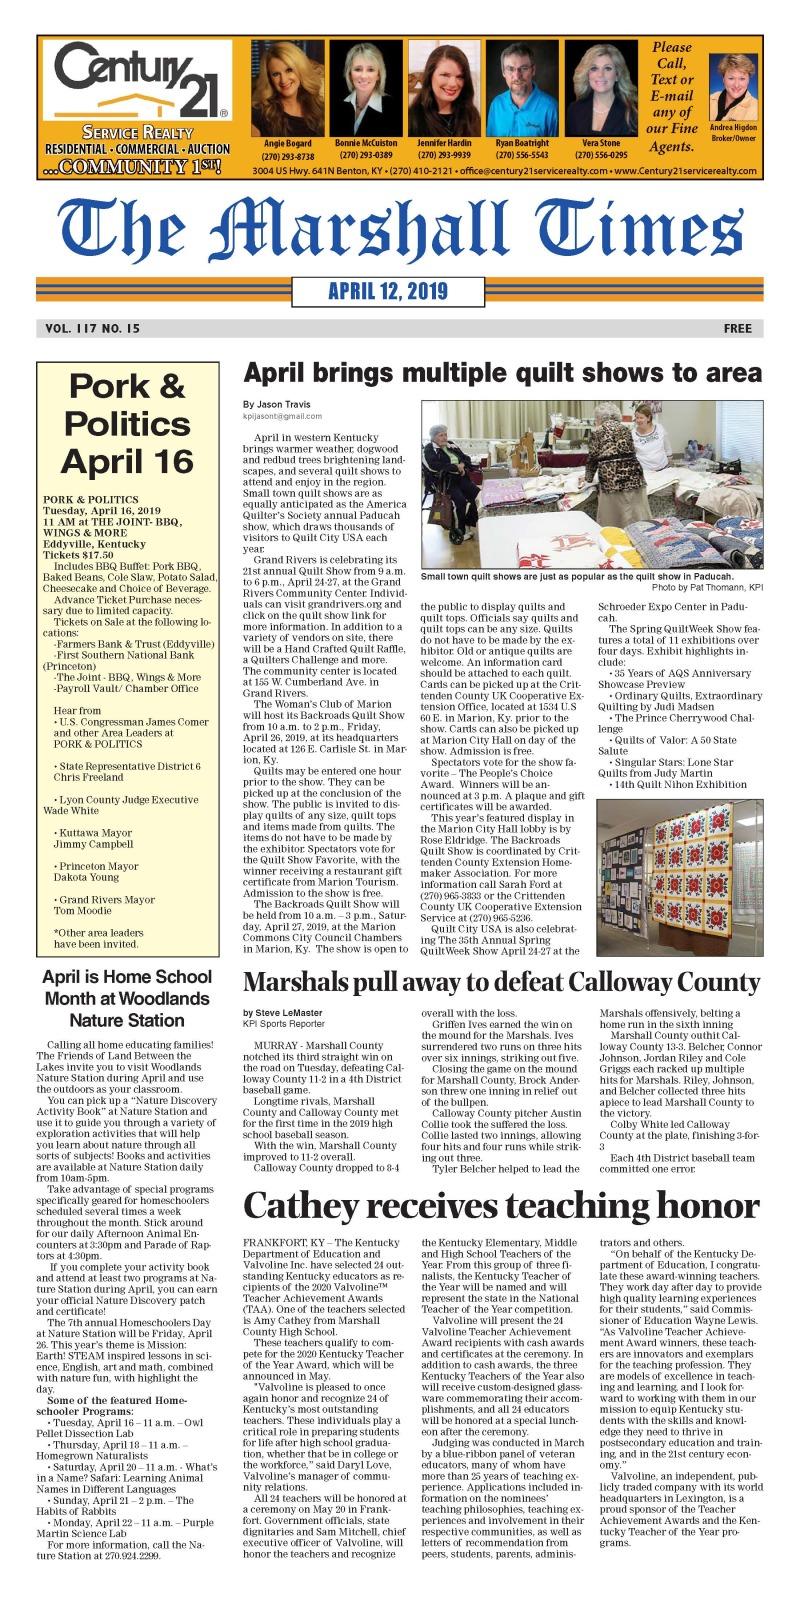 The Marshall Times 4-12-19